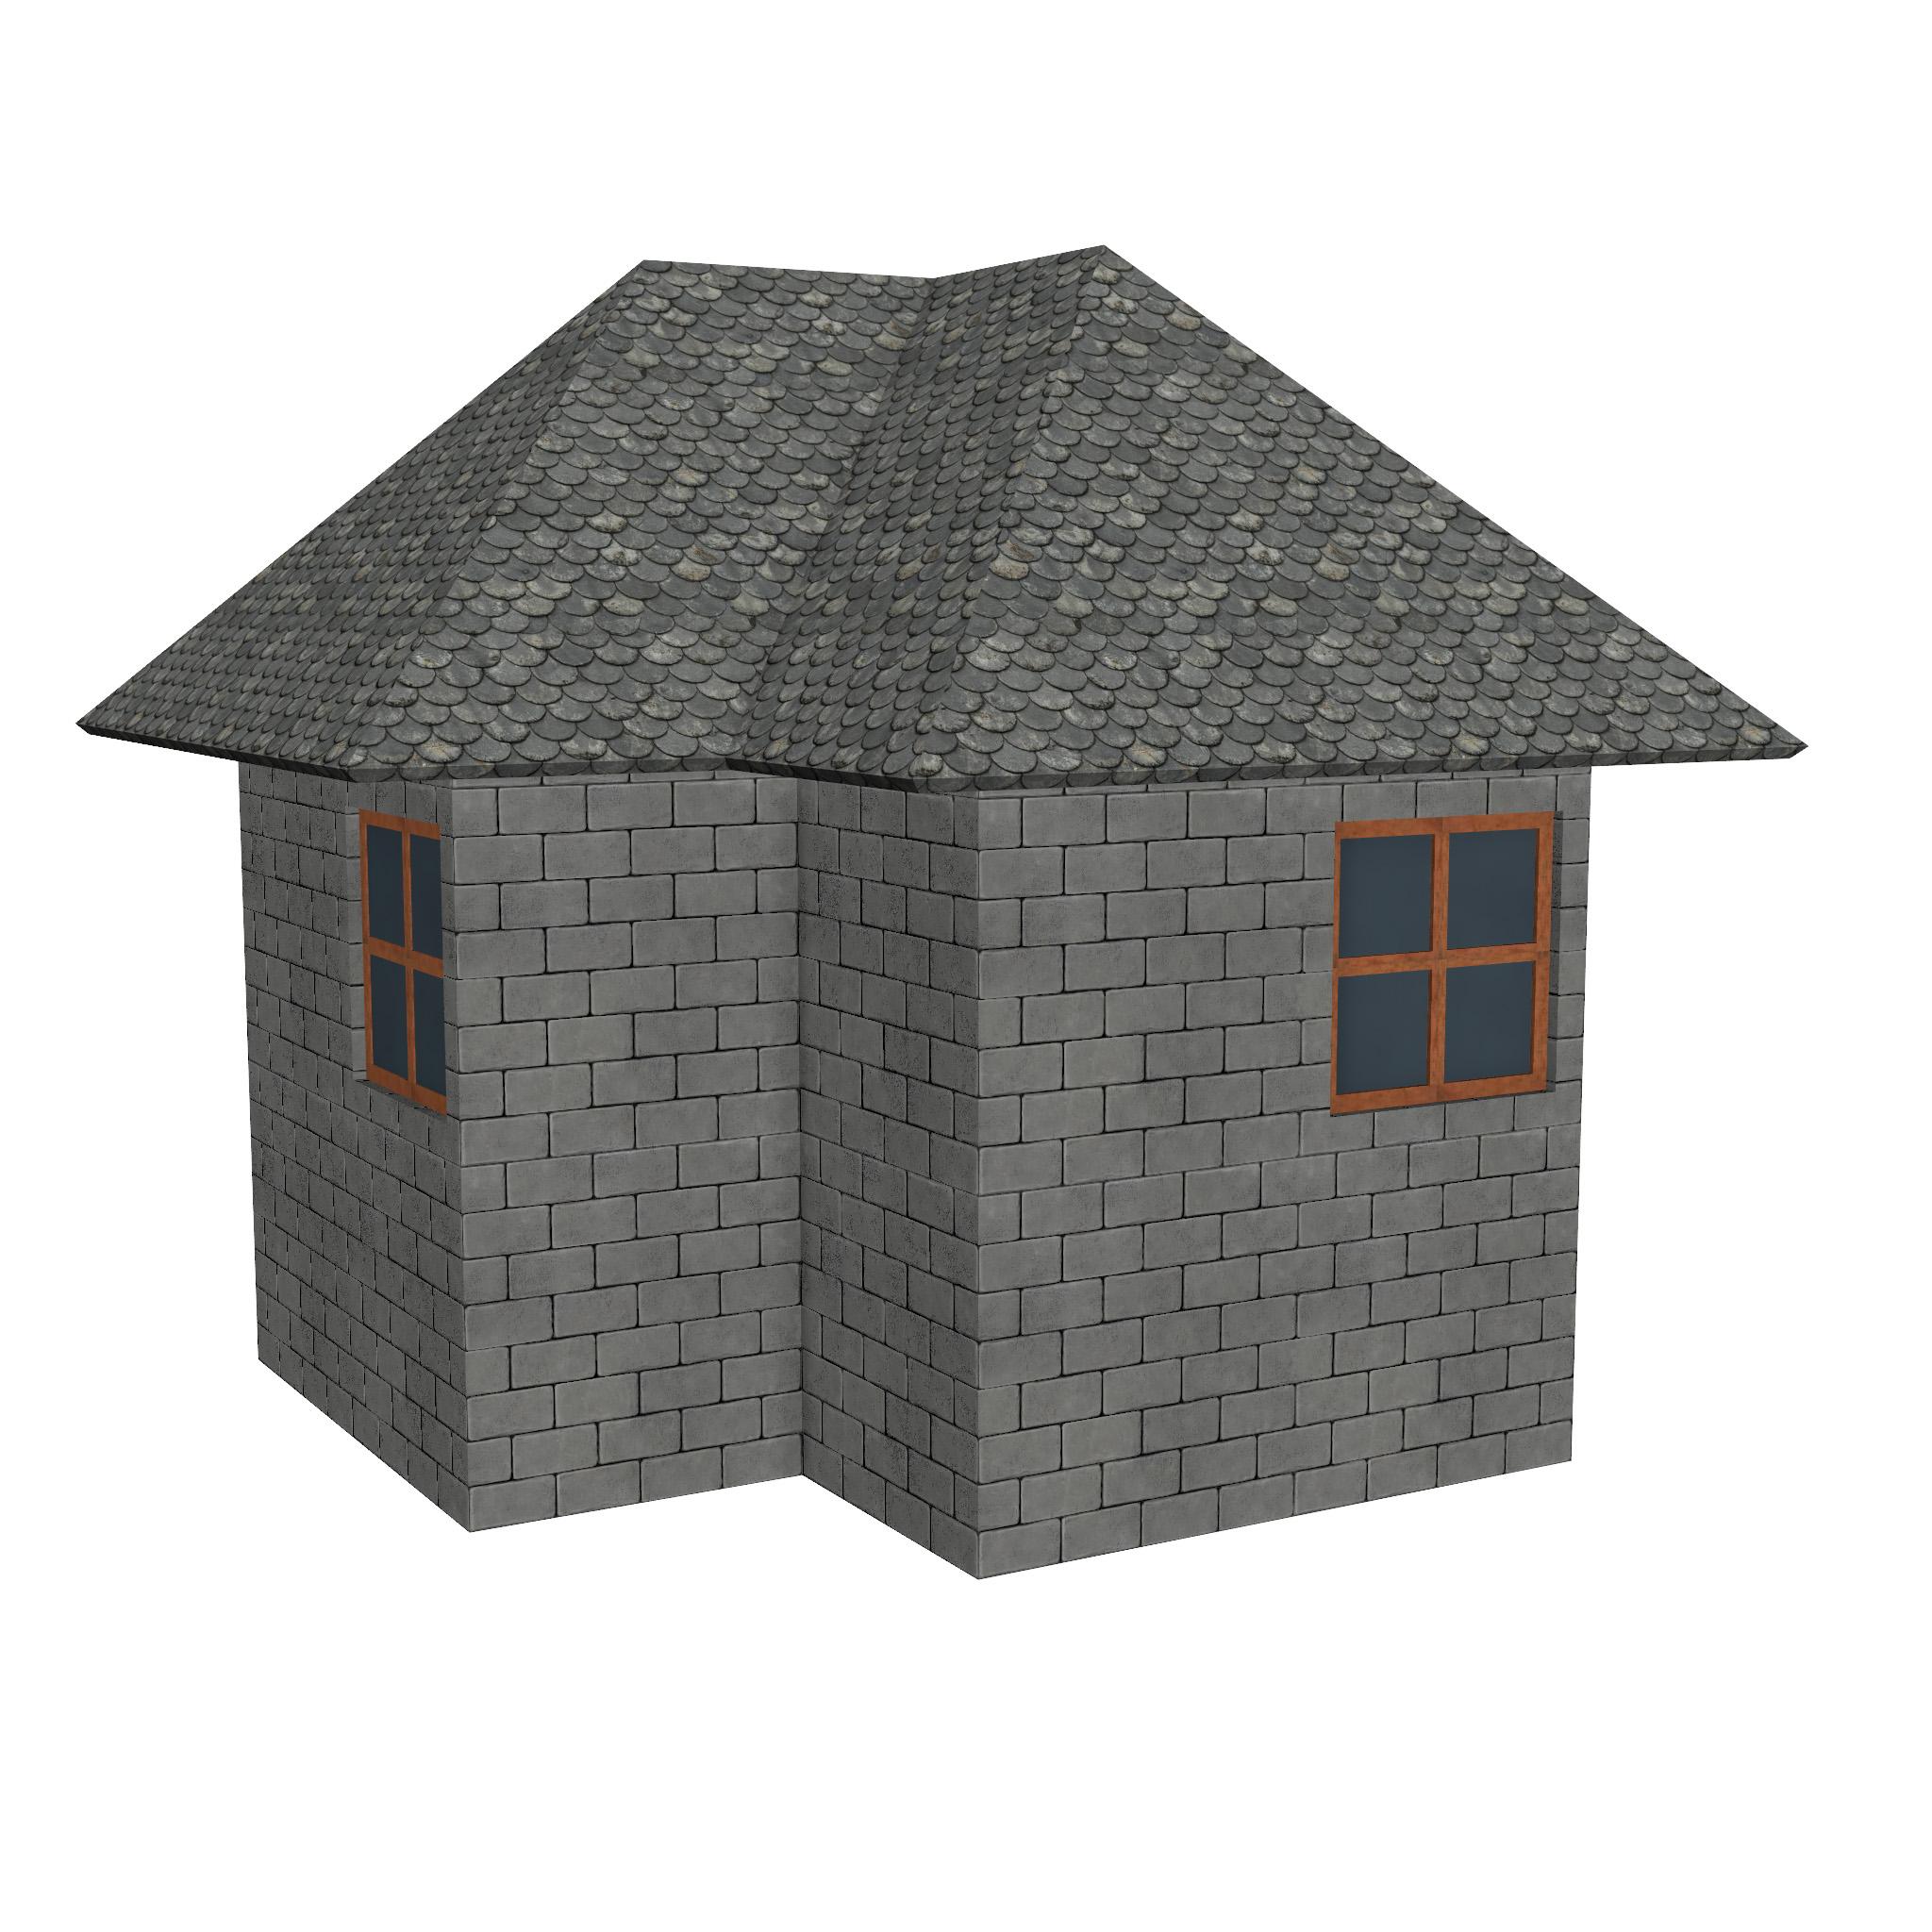 modular brick house set 3d model fbx ma mb 271410